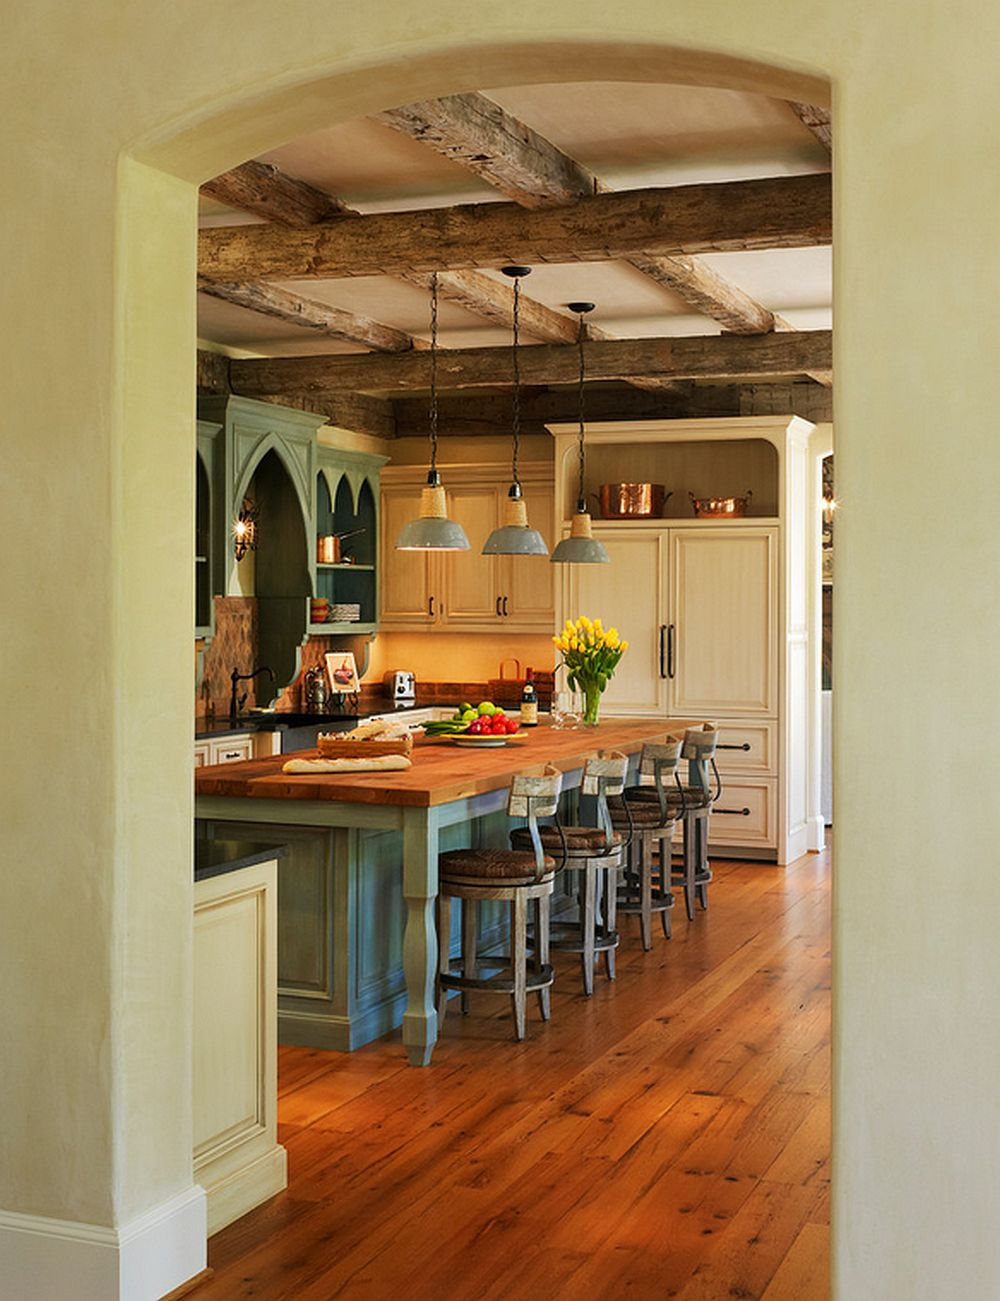 adelaparvu.com despre casa in stil rustic francez, proiect Barnes Vanze Architects, Foto Anice Hoachlander  (7)